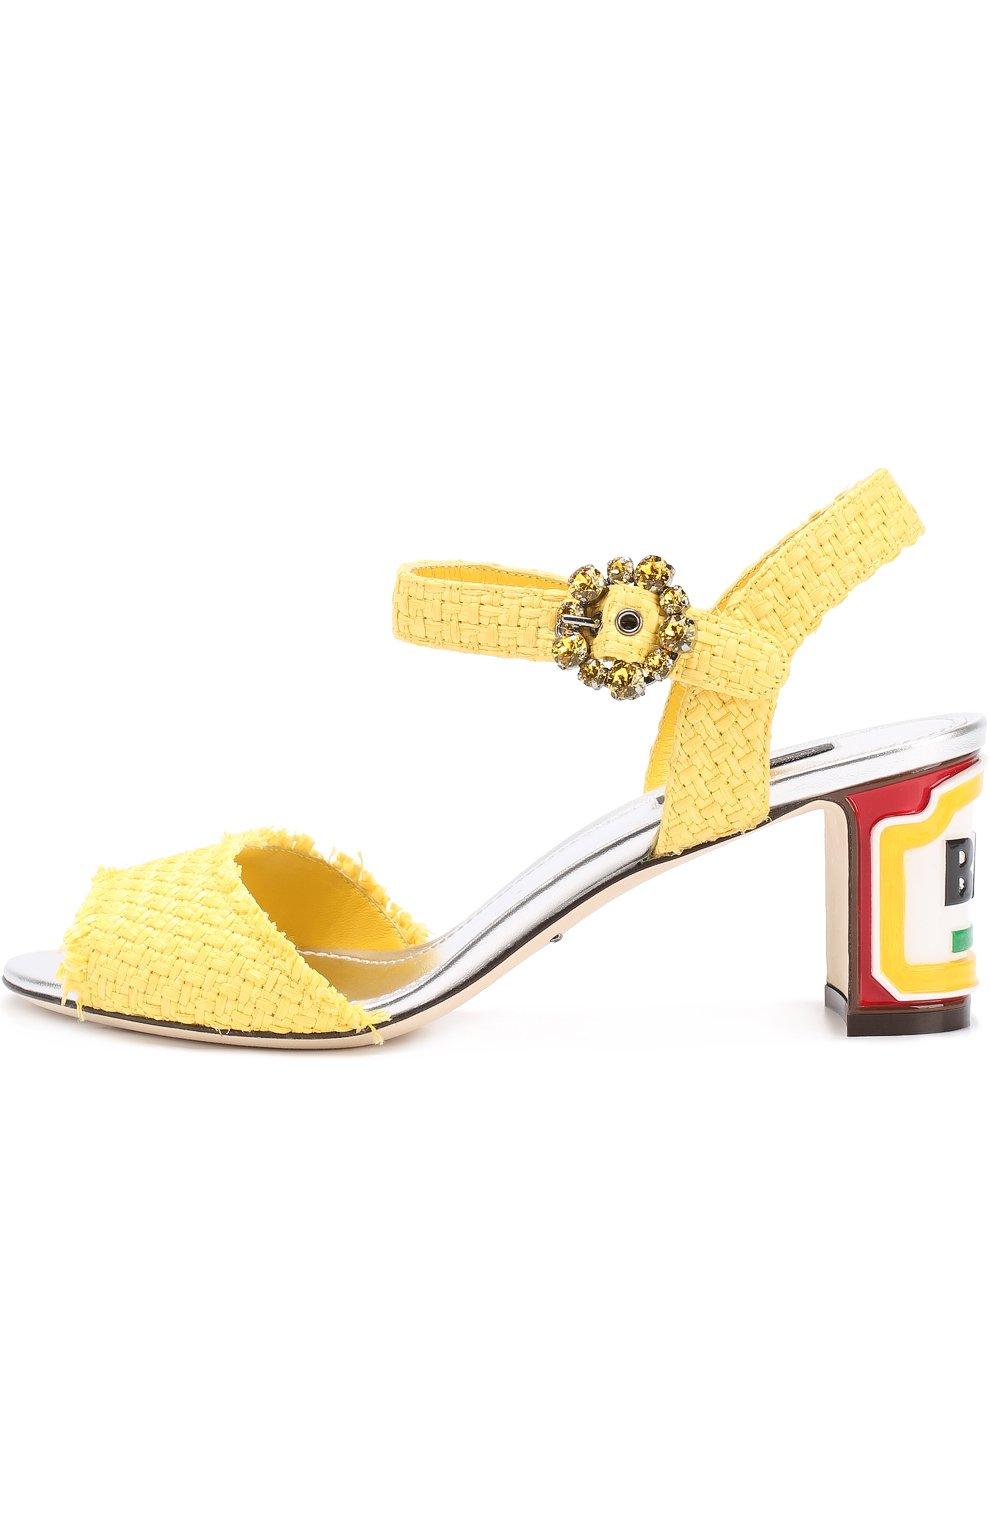 Плетеные босоножки Keira на каблуке с декором Dolce & Gabbana желтые   Фото №2